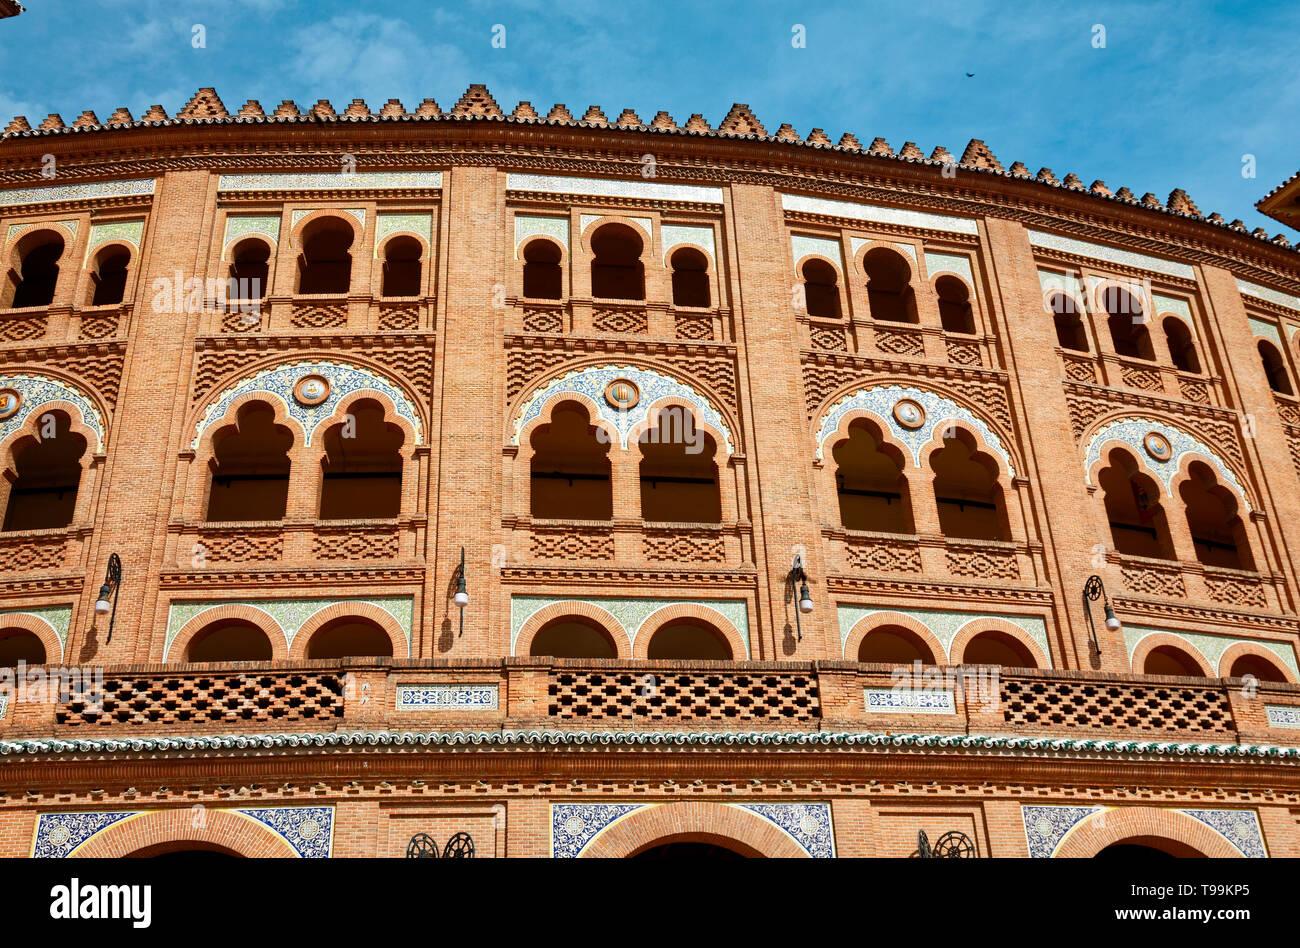 Las Ventas Bullring, 1931, large arena, Neo-Mudejar style, decorative tiles, red brick, close-up, intricate detail, arches, Europe; Madrid; Spain; spr - Stock Image